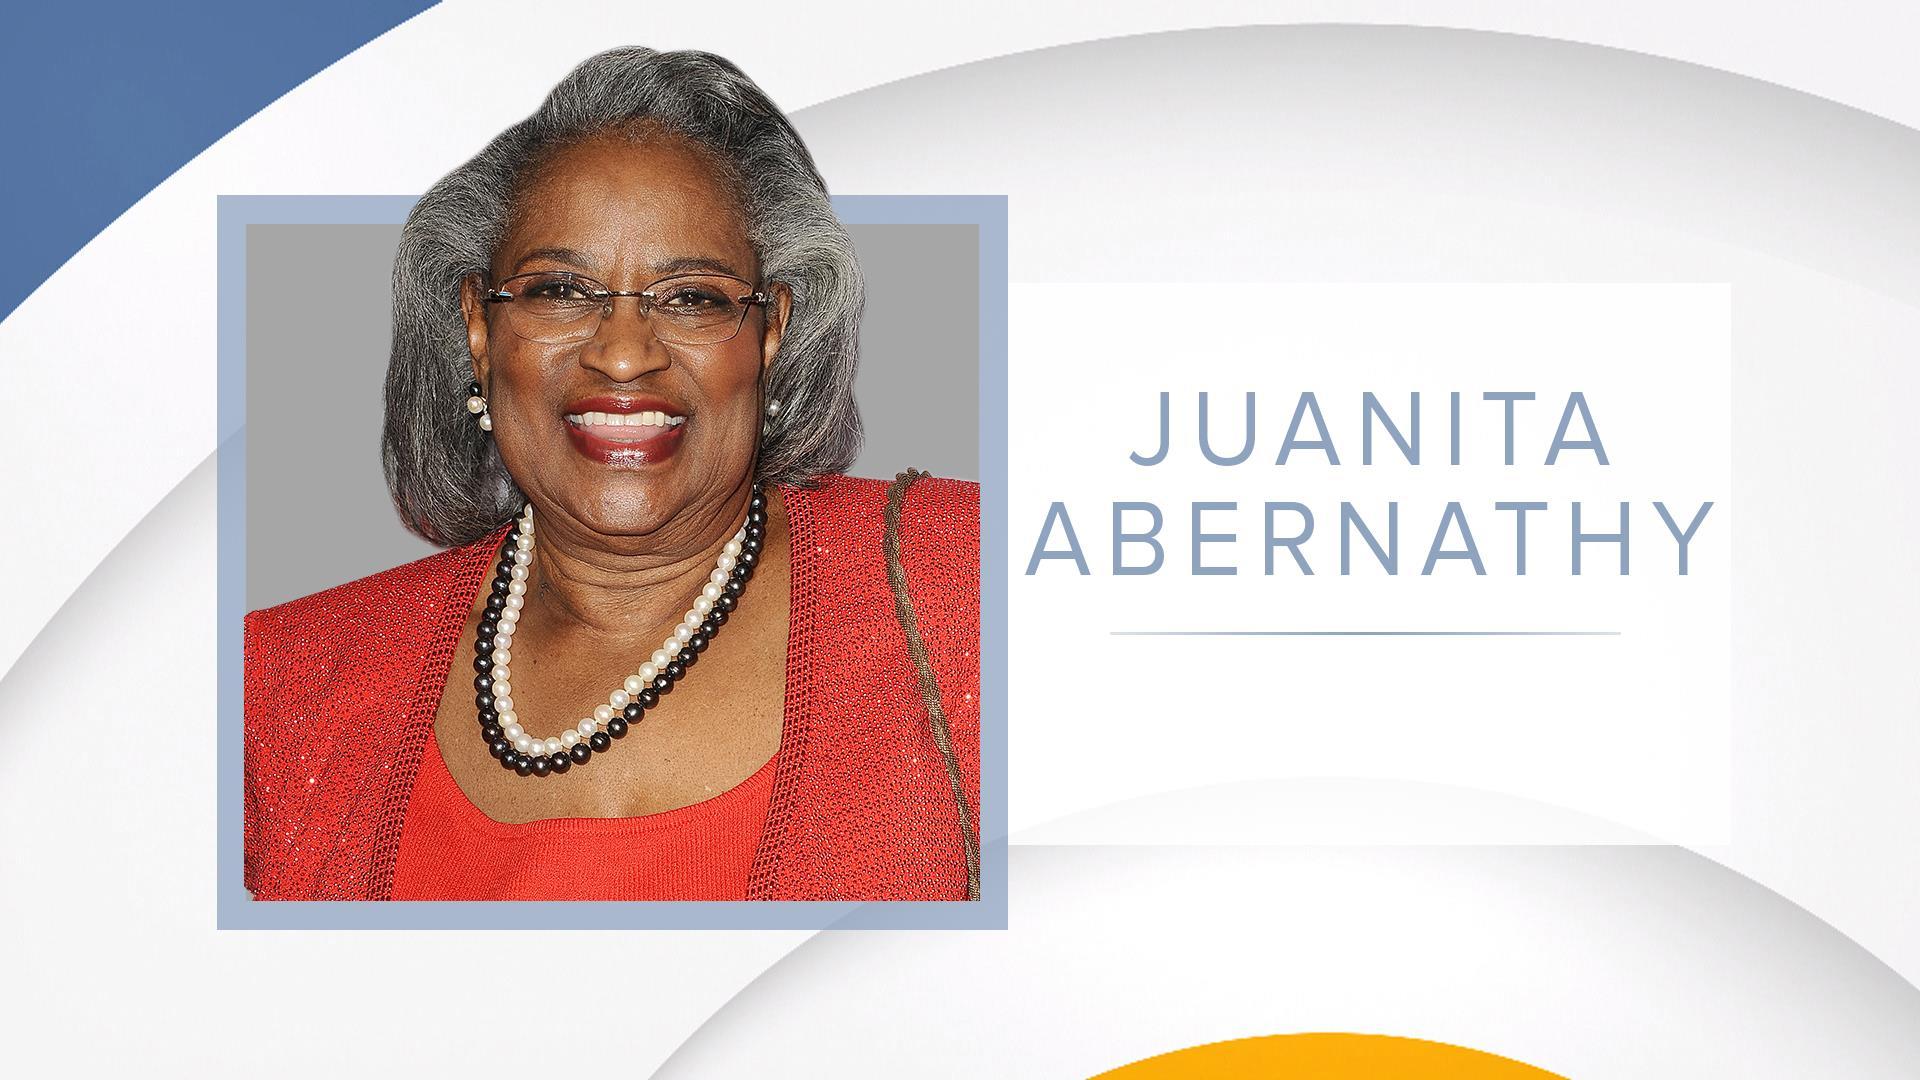 Civil rights advocate Juanita Abernathy dies